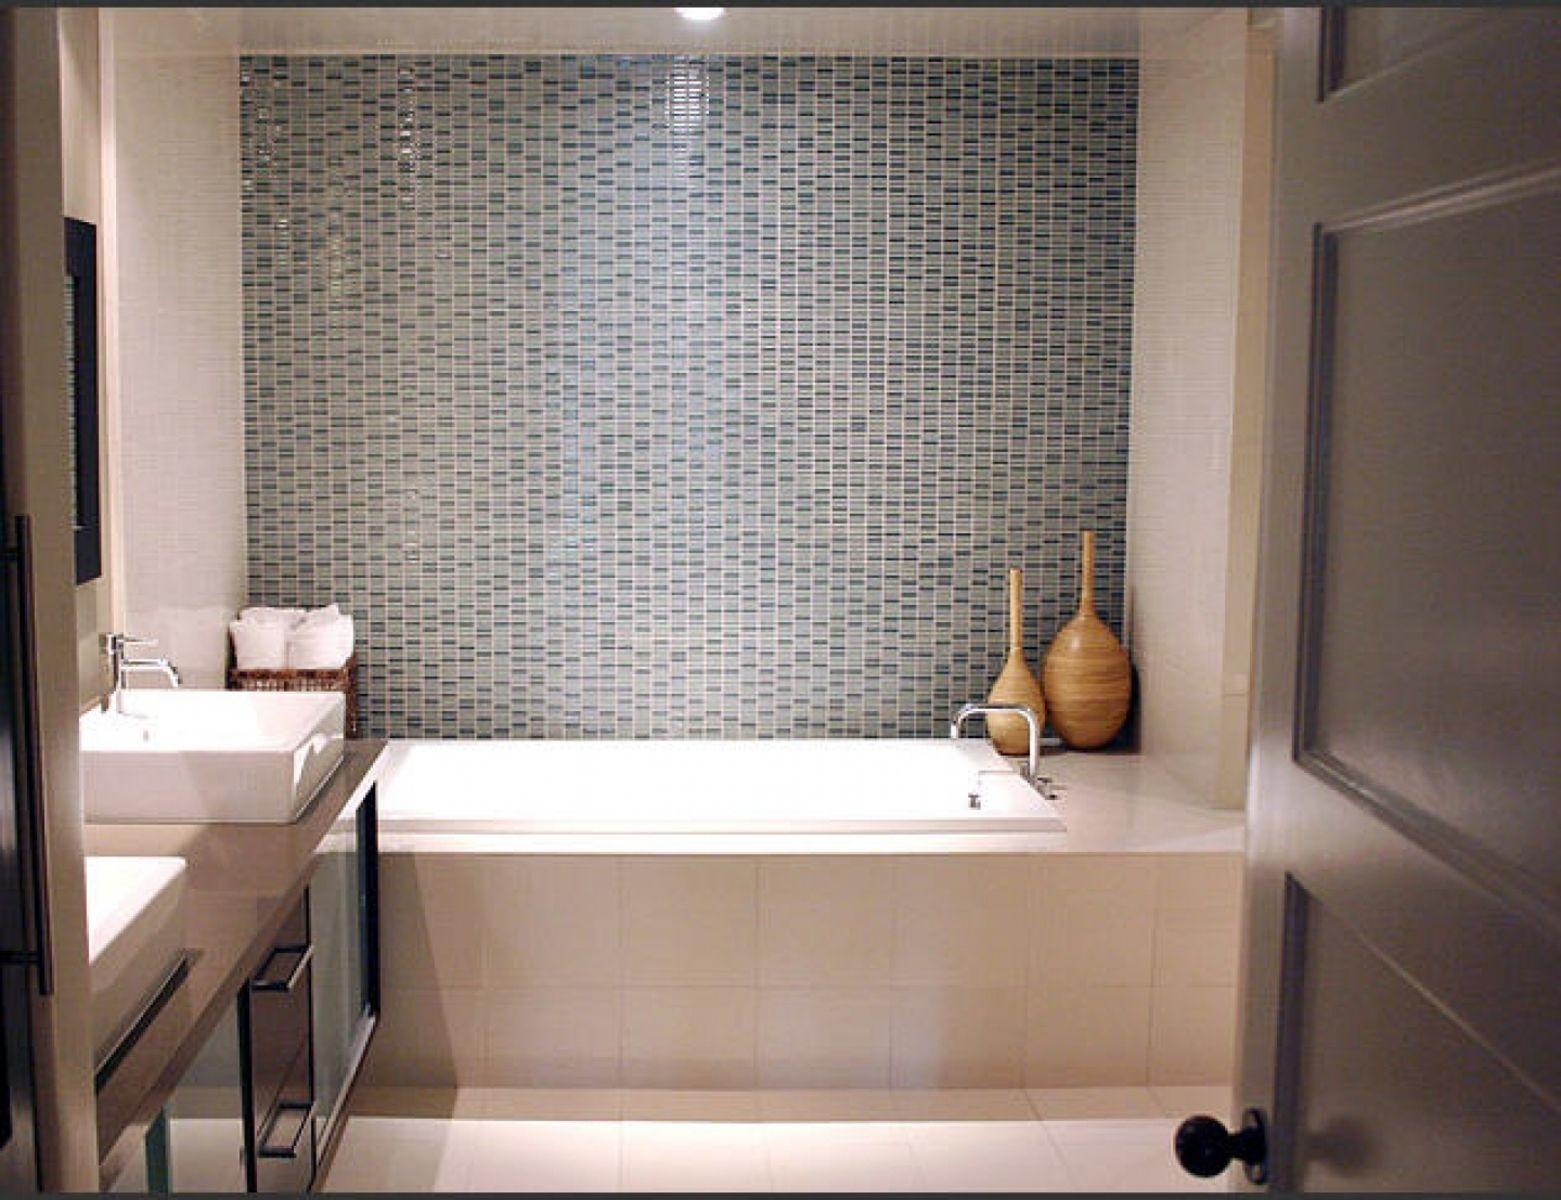 1600x1200 Px Interior Photo Small Space Modern Bathroom Tile